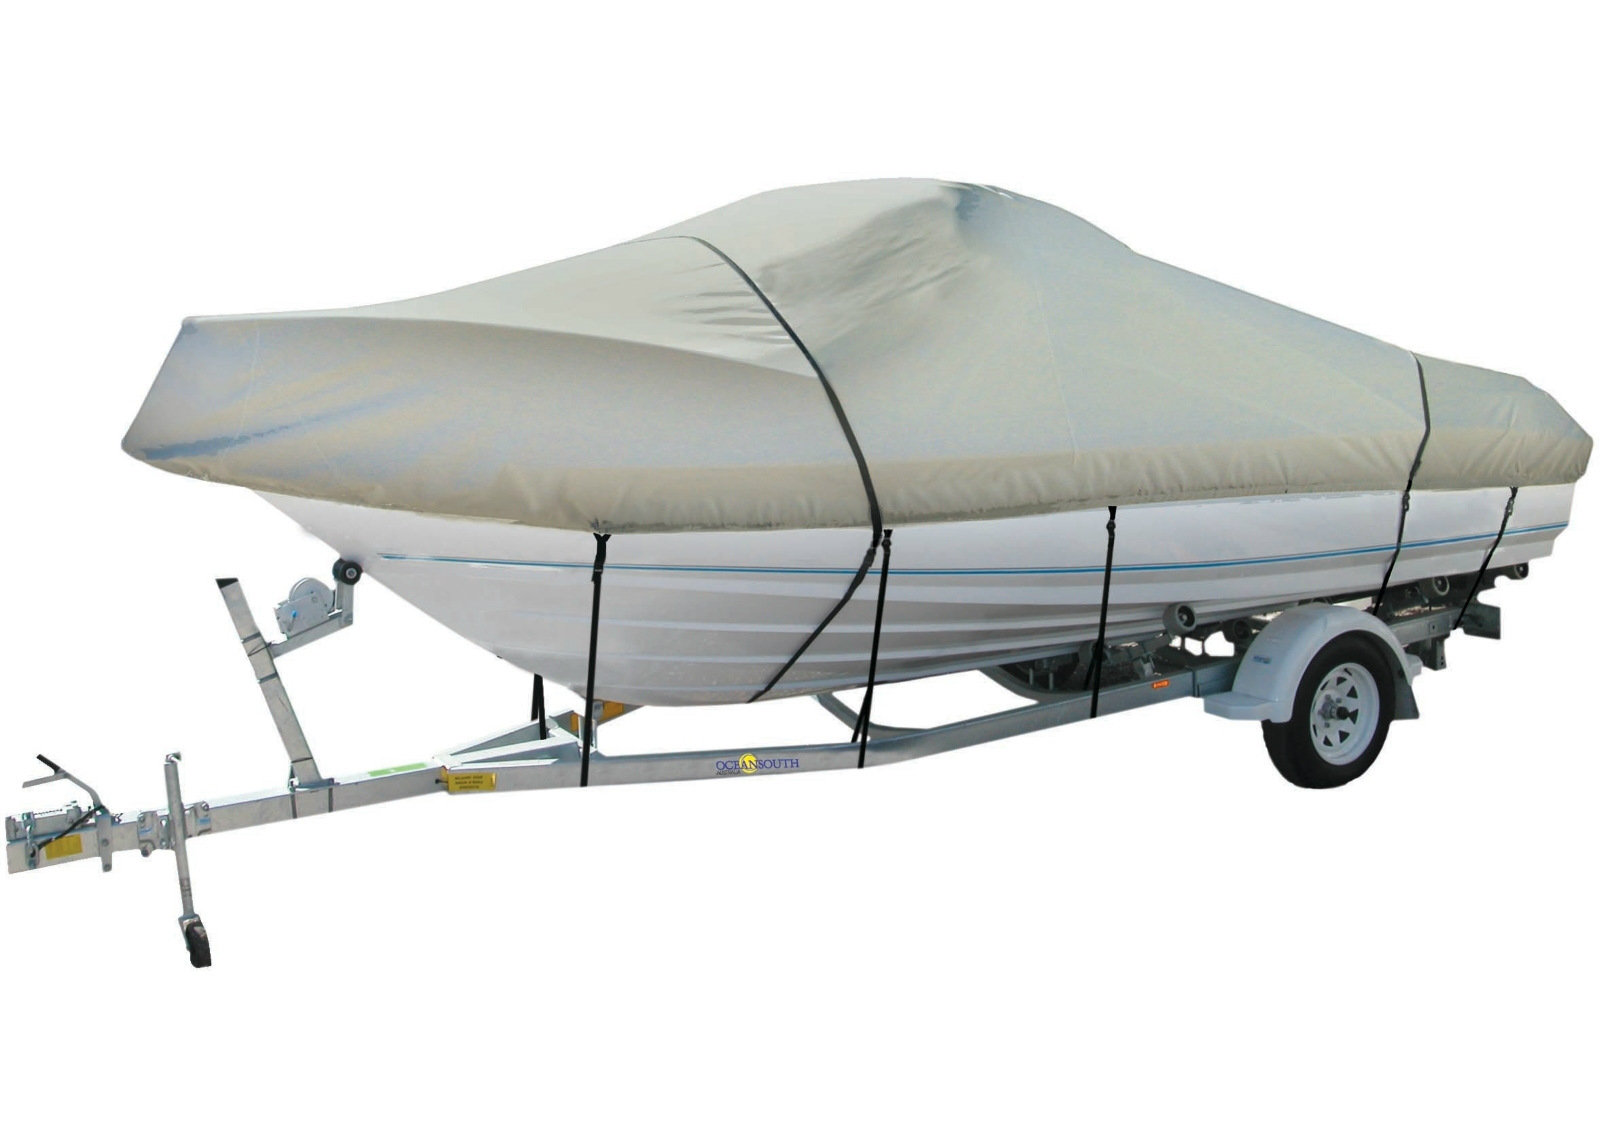 Venepeite Cabin Cruiser tyyppisille veneille 6.3-6.7 m